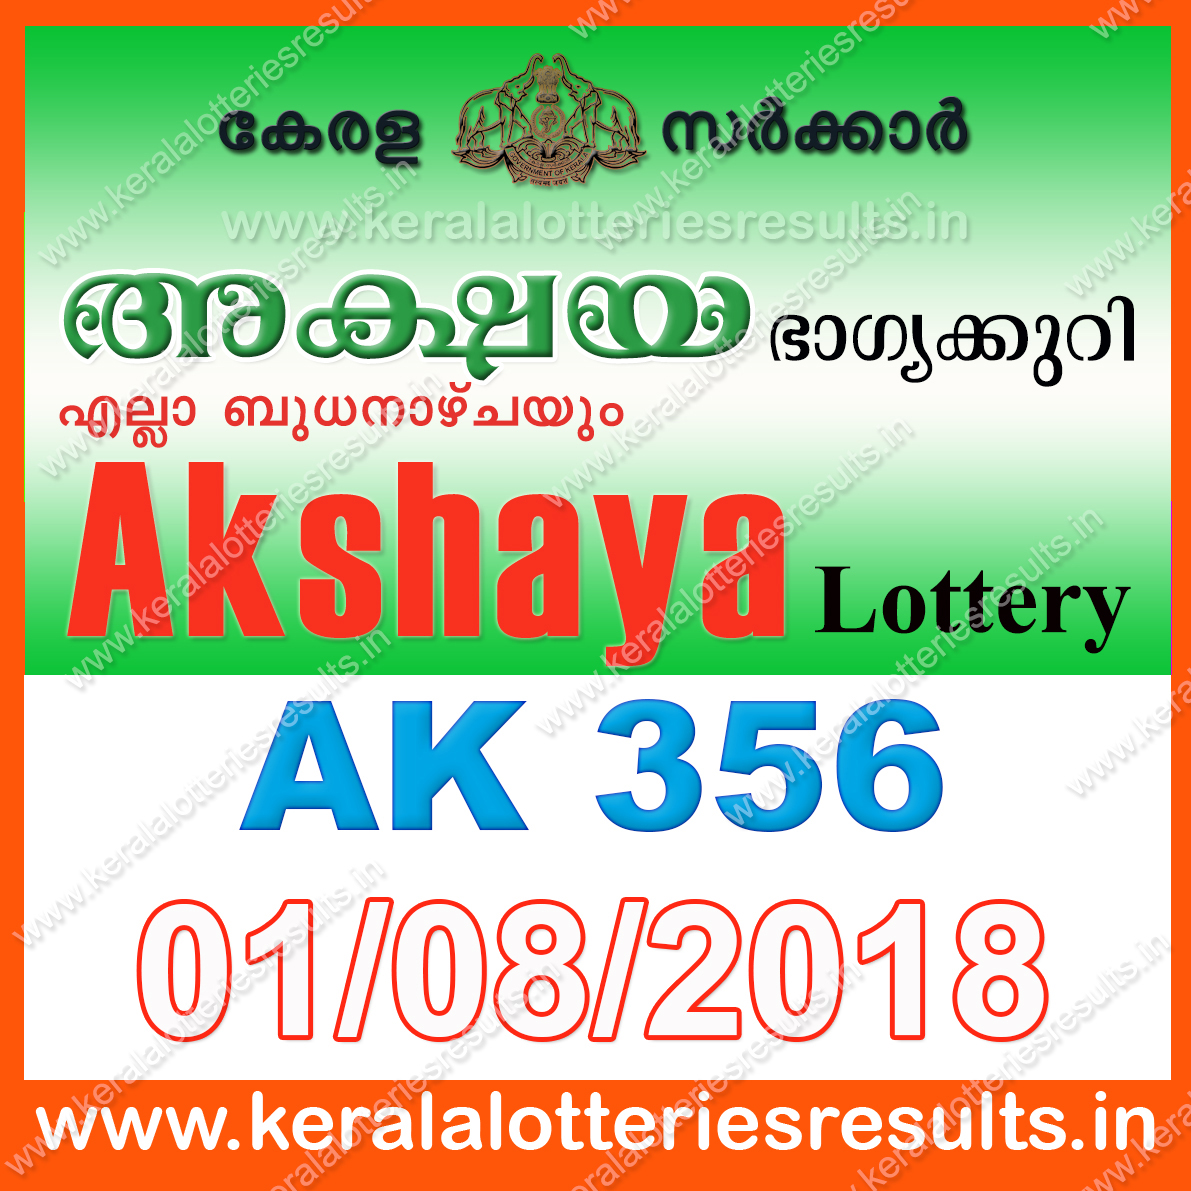 Kerala Lottery Result; 01-08-2018